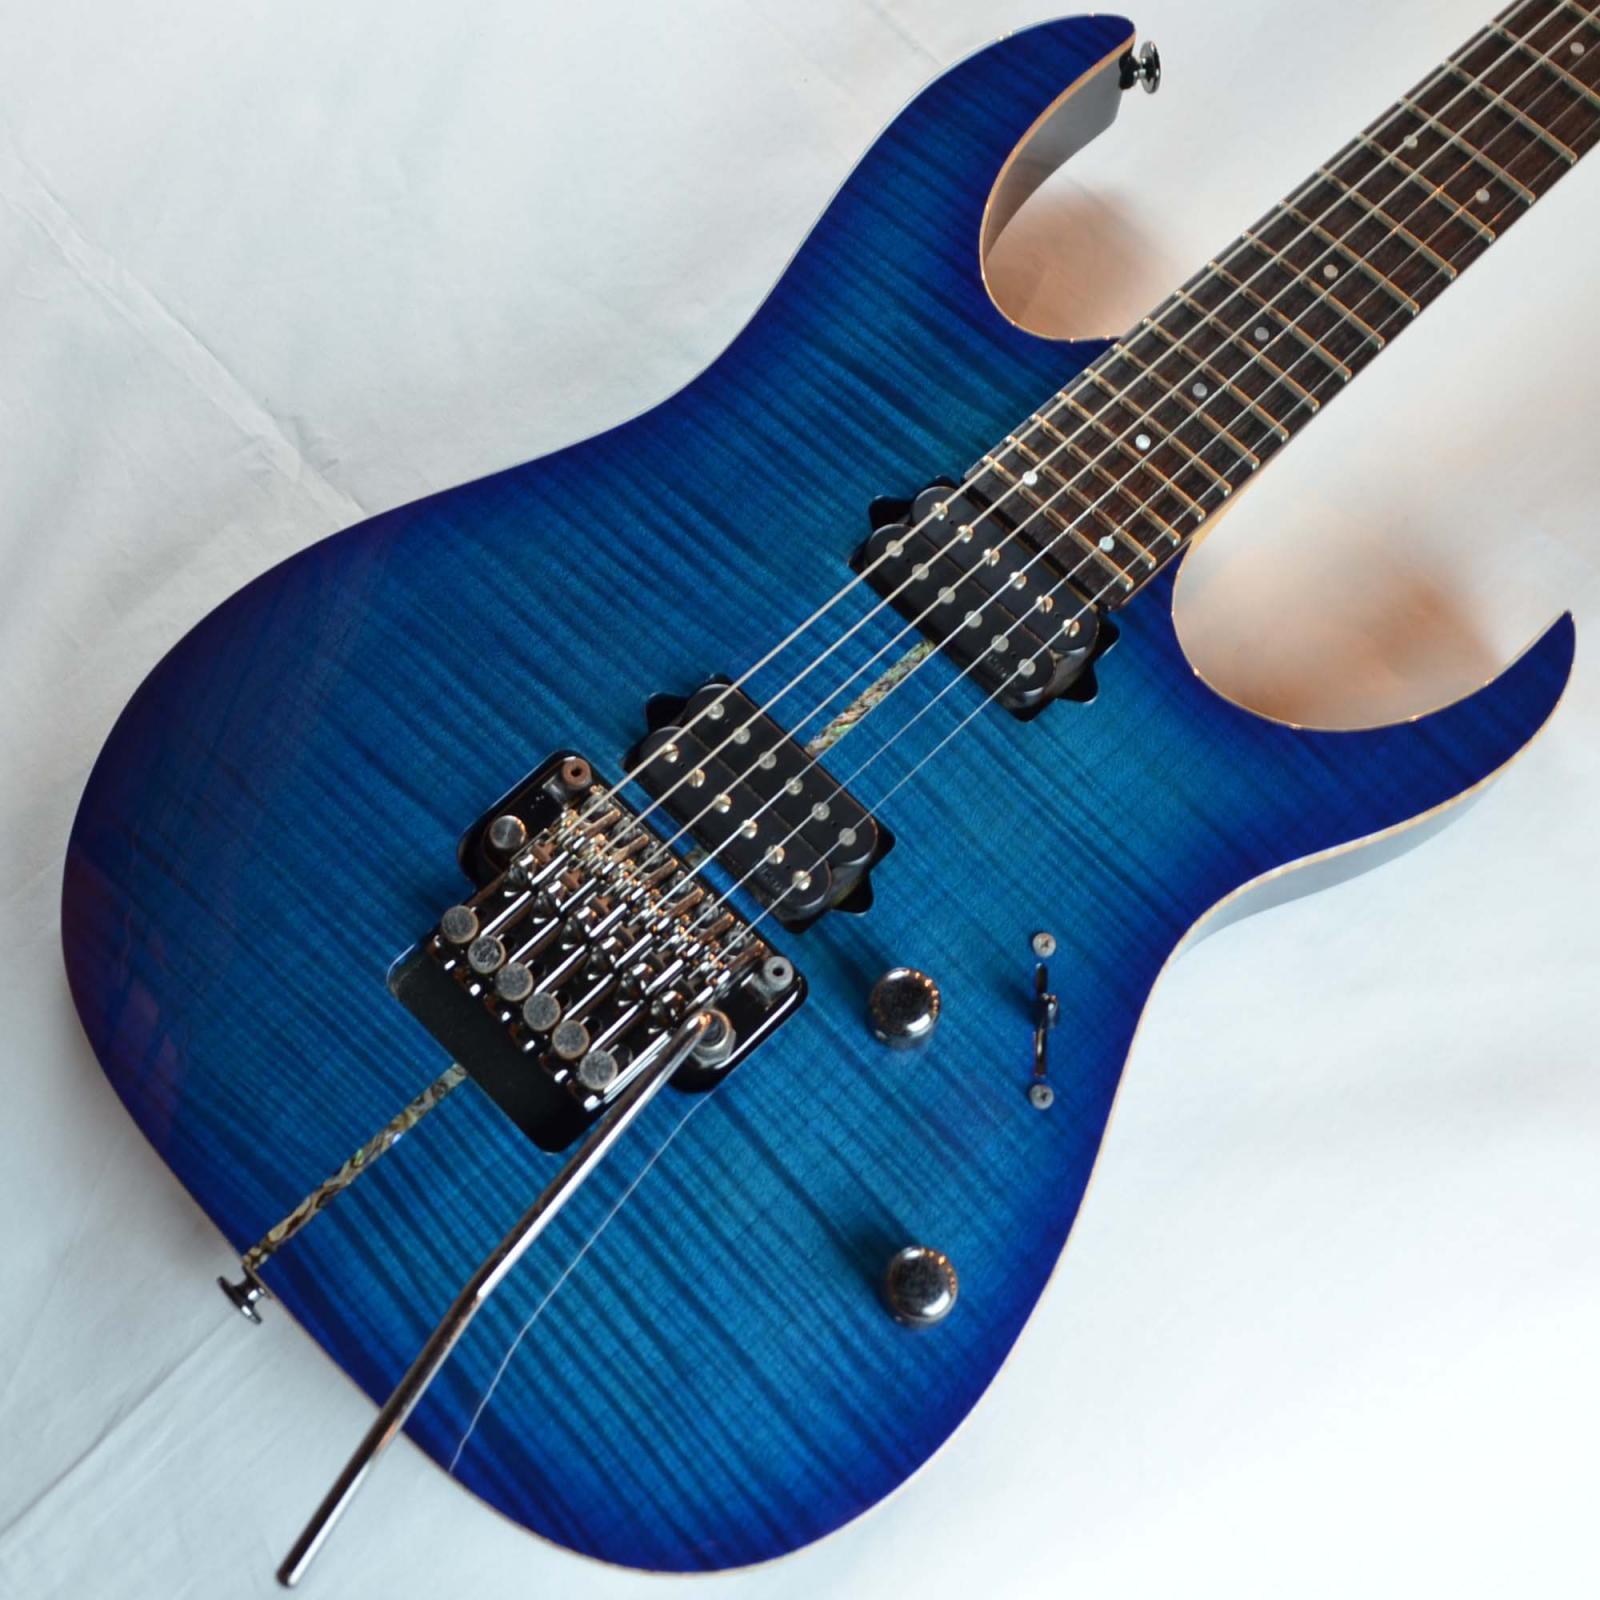 Ibanez RG-3520Z | Shimokura Musical Instruments